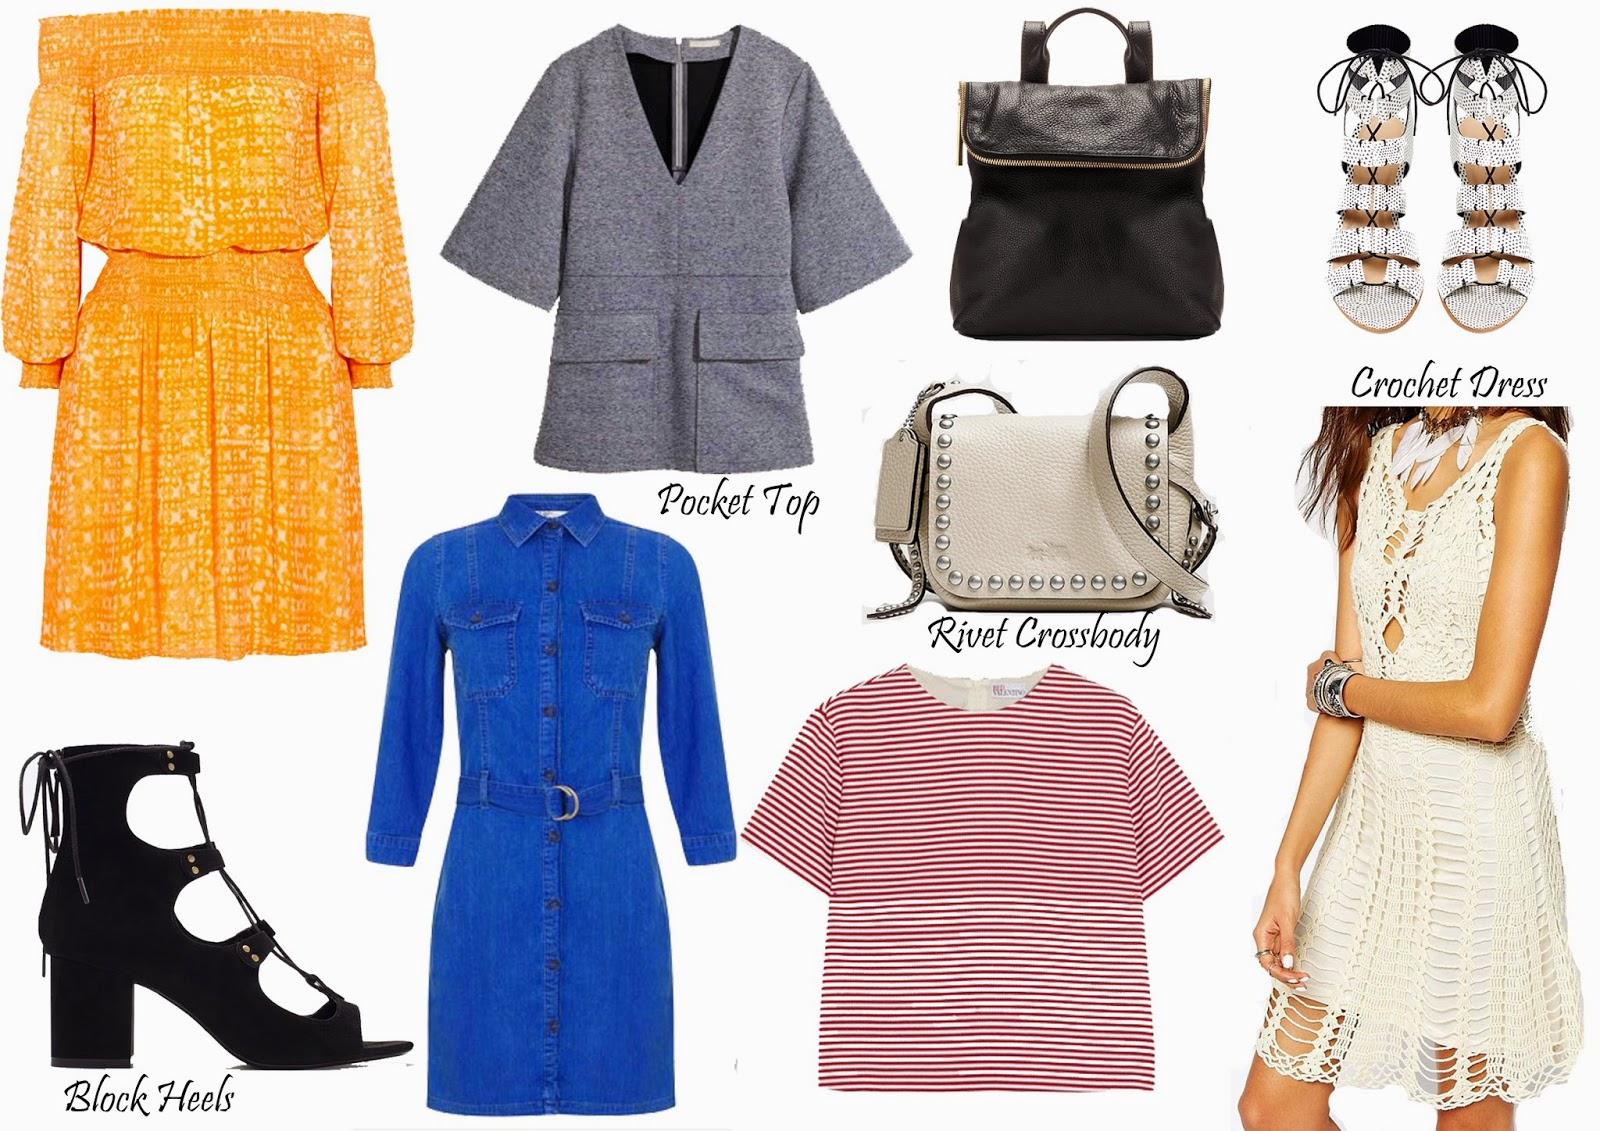 Wednesday Wishlist 22.04.15 on Laura Rebecca Smith Fashion Blog